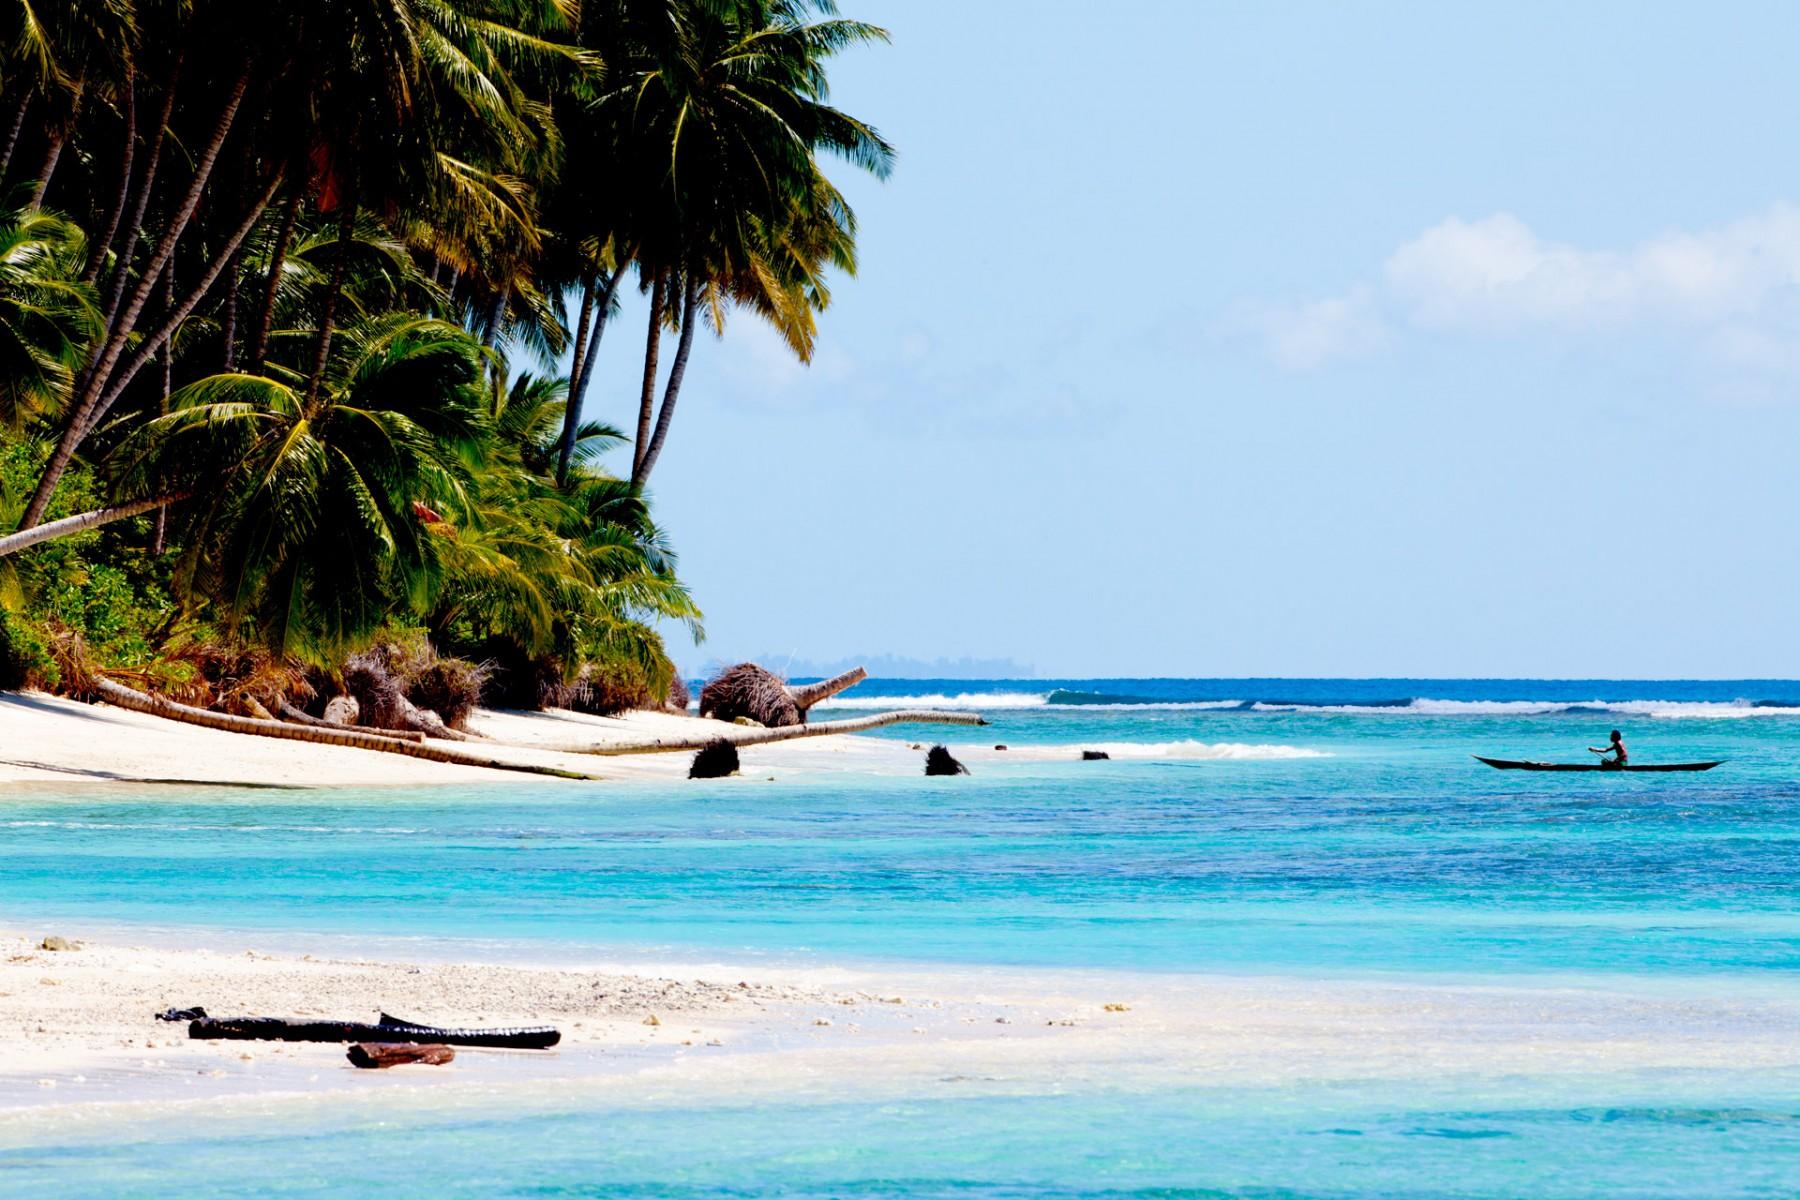 tropical_island_Mentawai-1800x1200